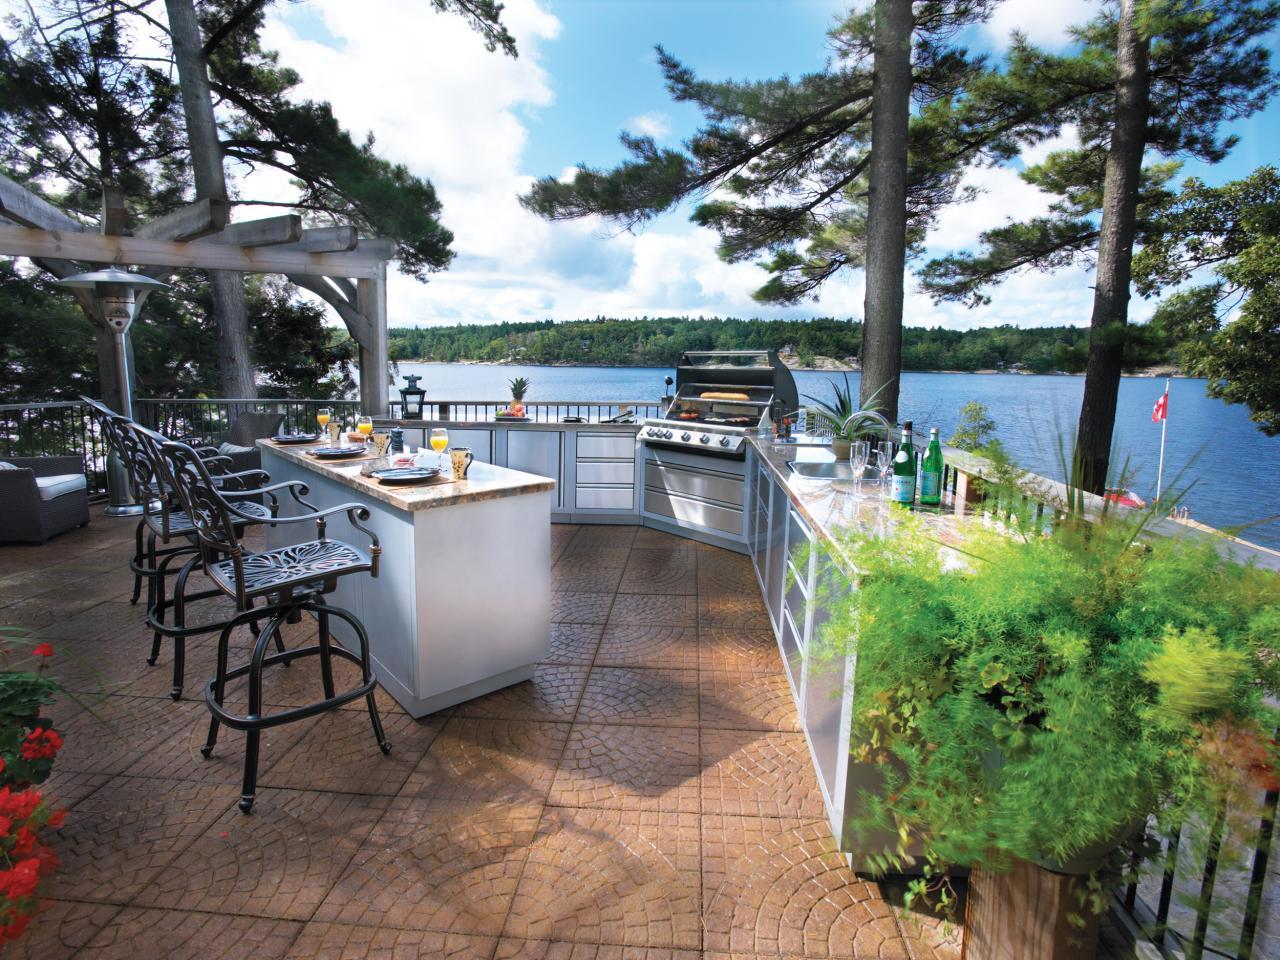 Uncategorized Outdoor Kitchen Island outdoor kitchen islands pictures tips expert ideas hgtv islands